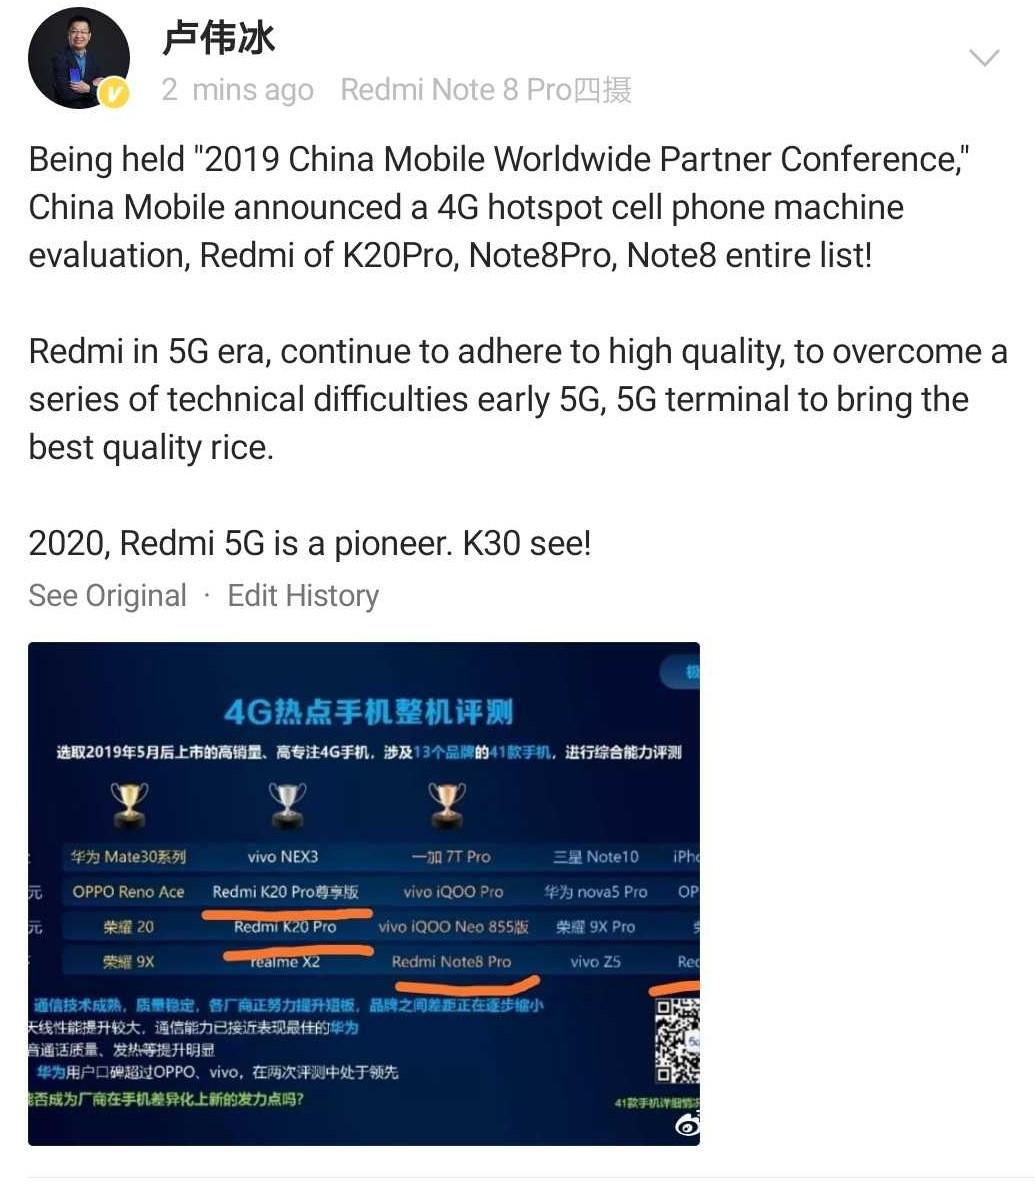 redmi k30 2020 launch